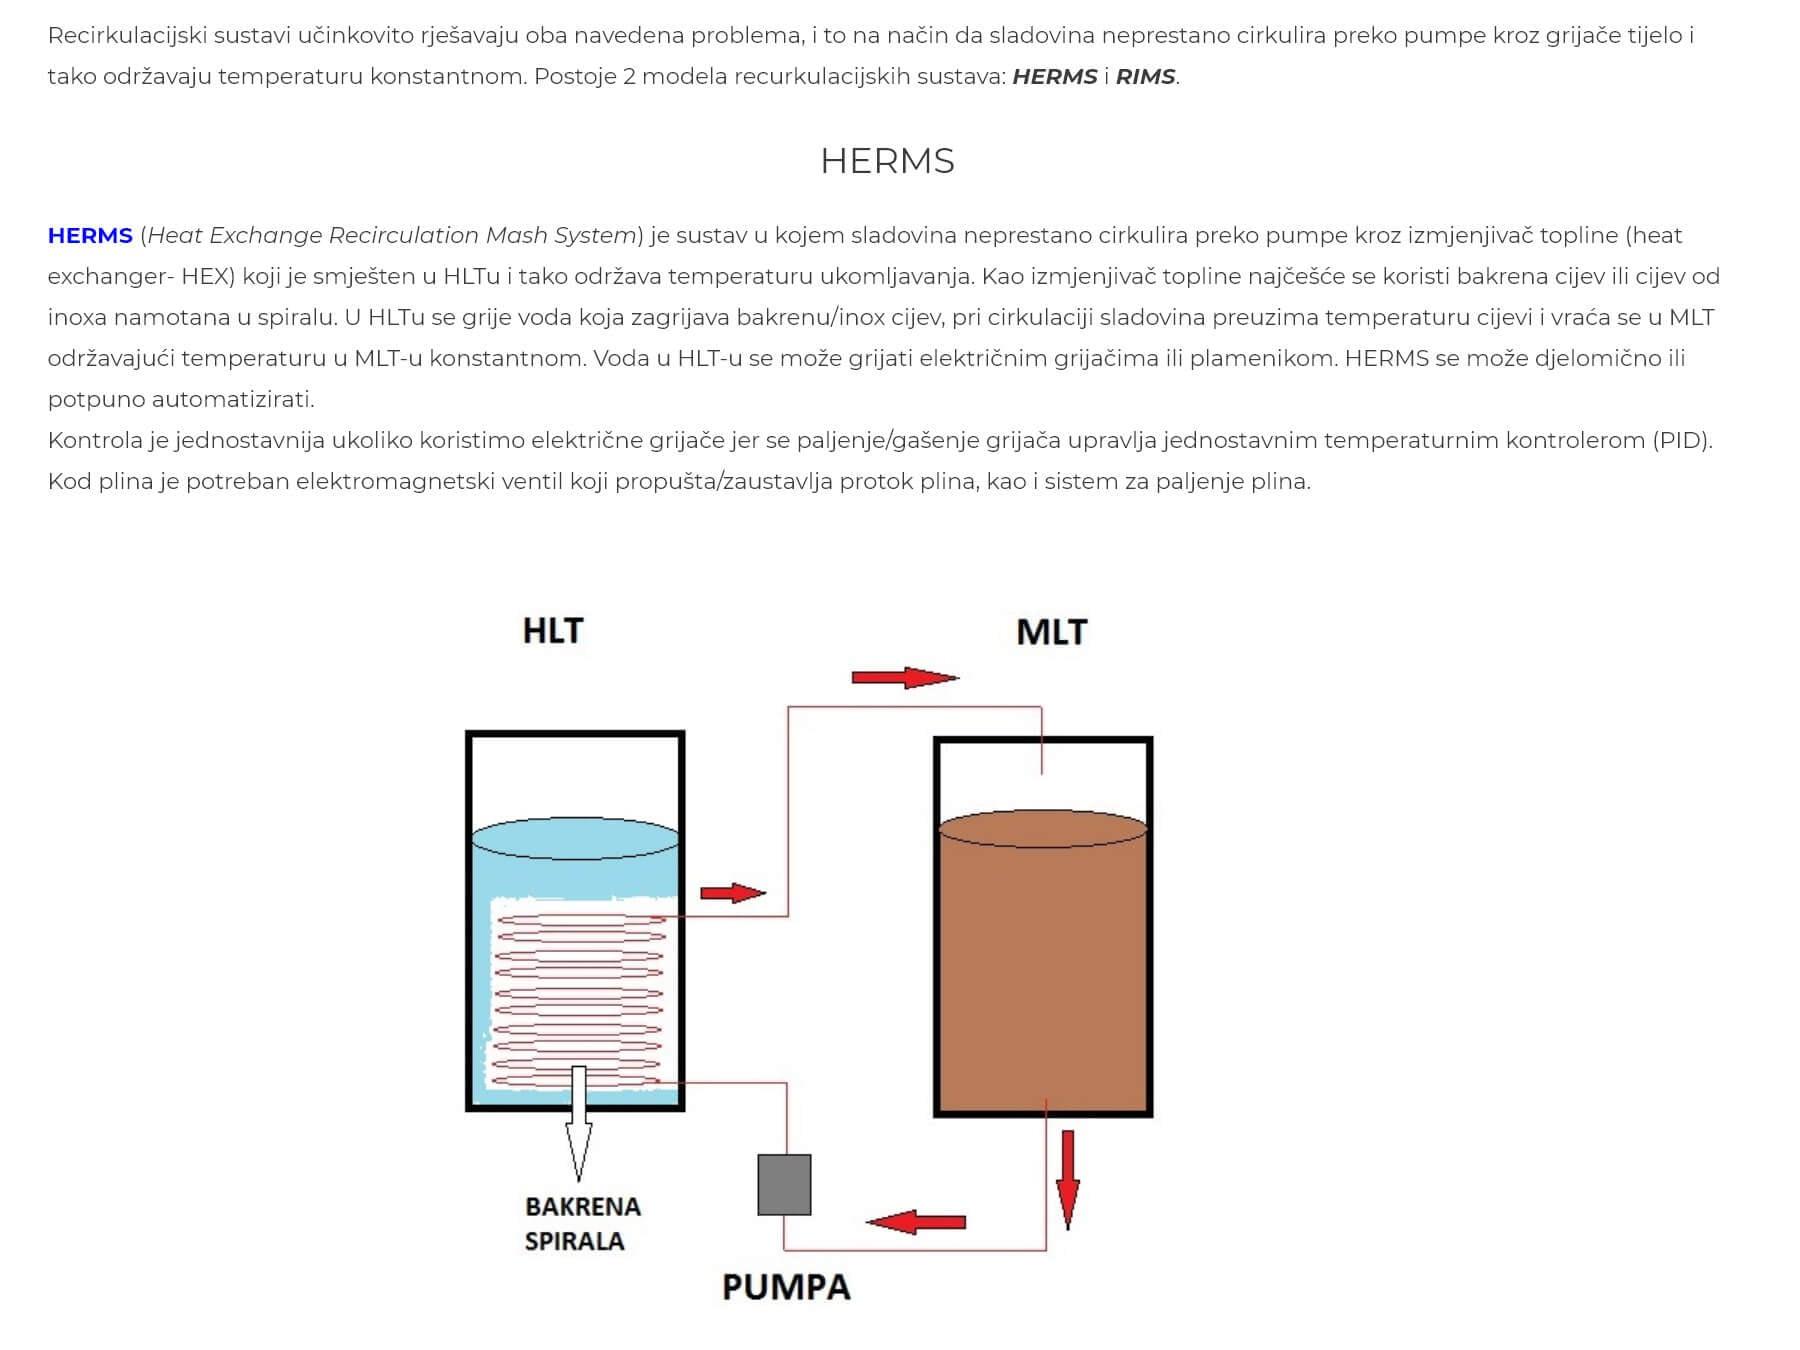 Škola piva opis sustava HERMS